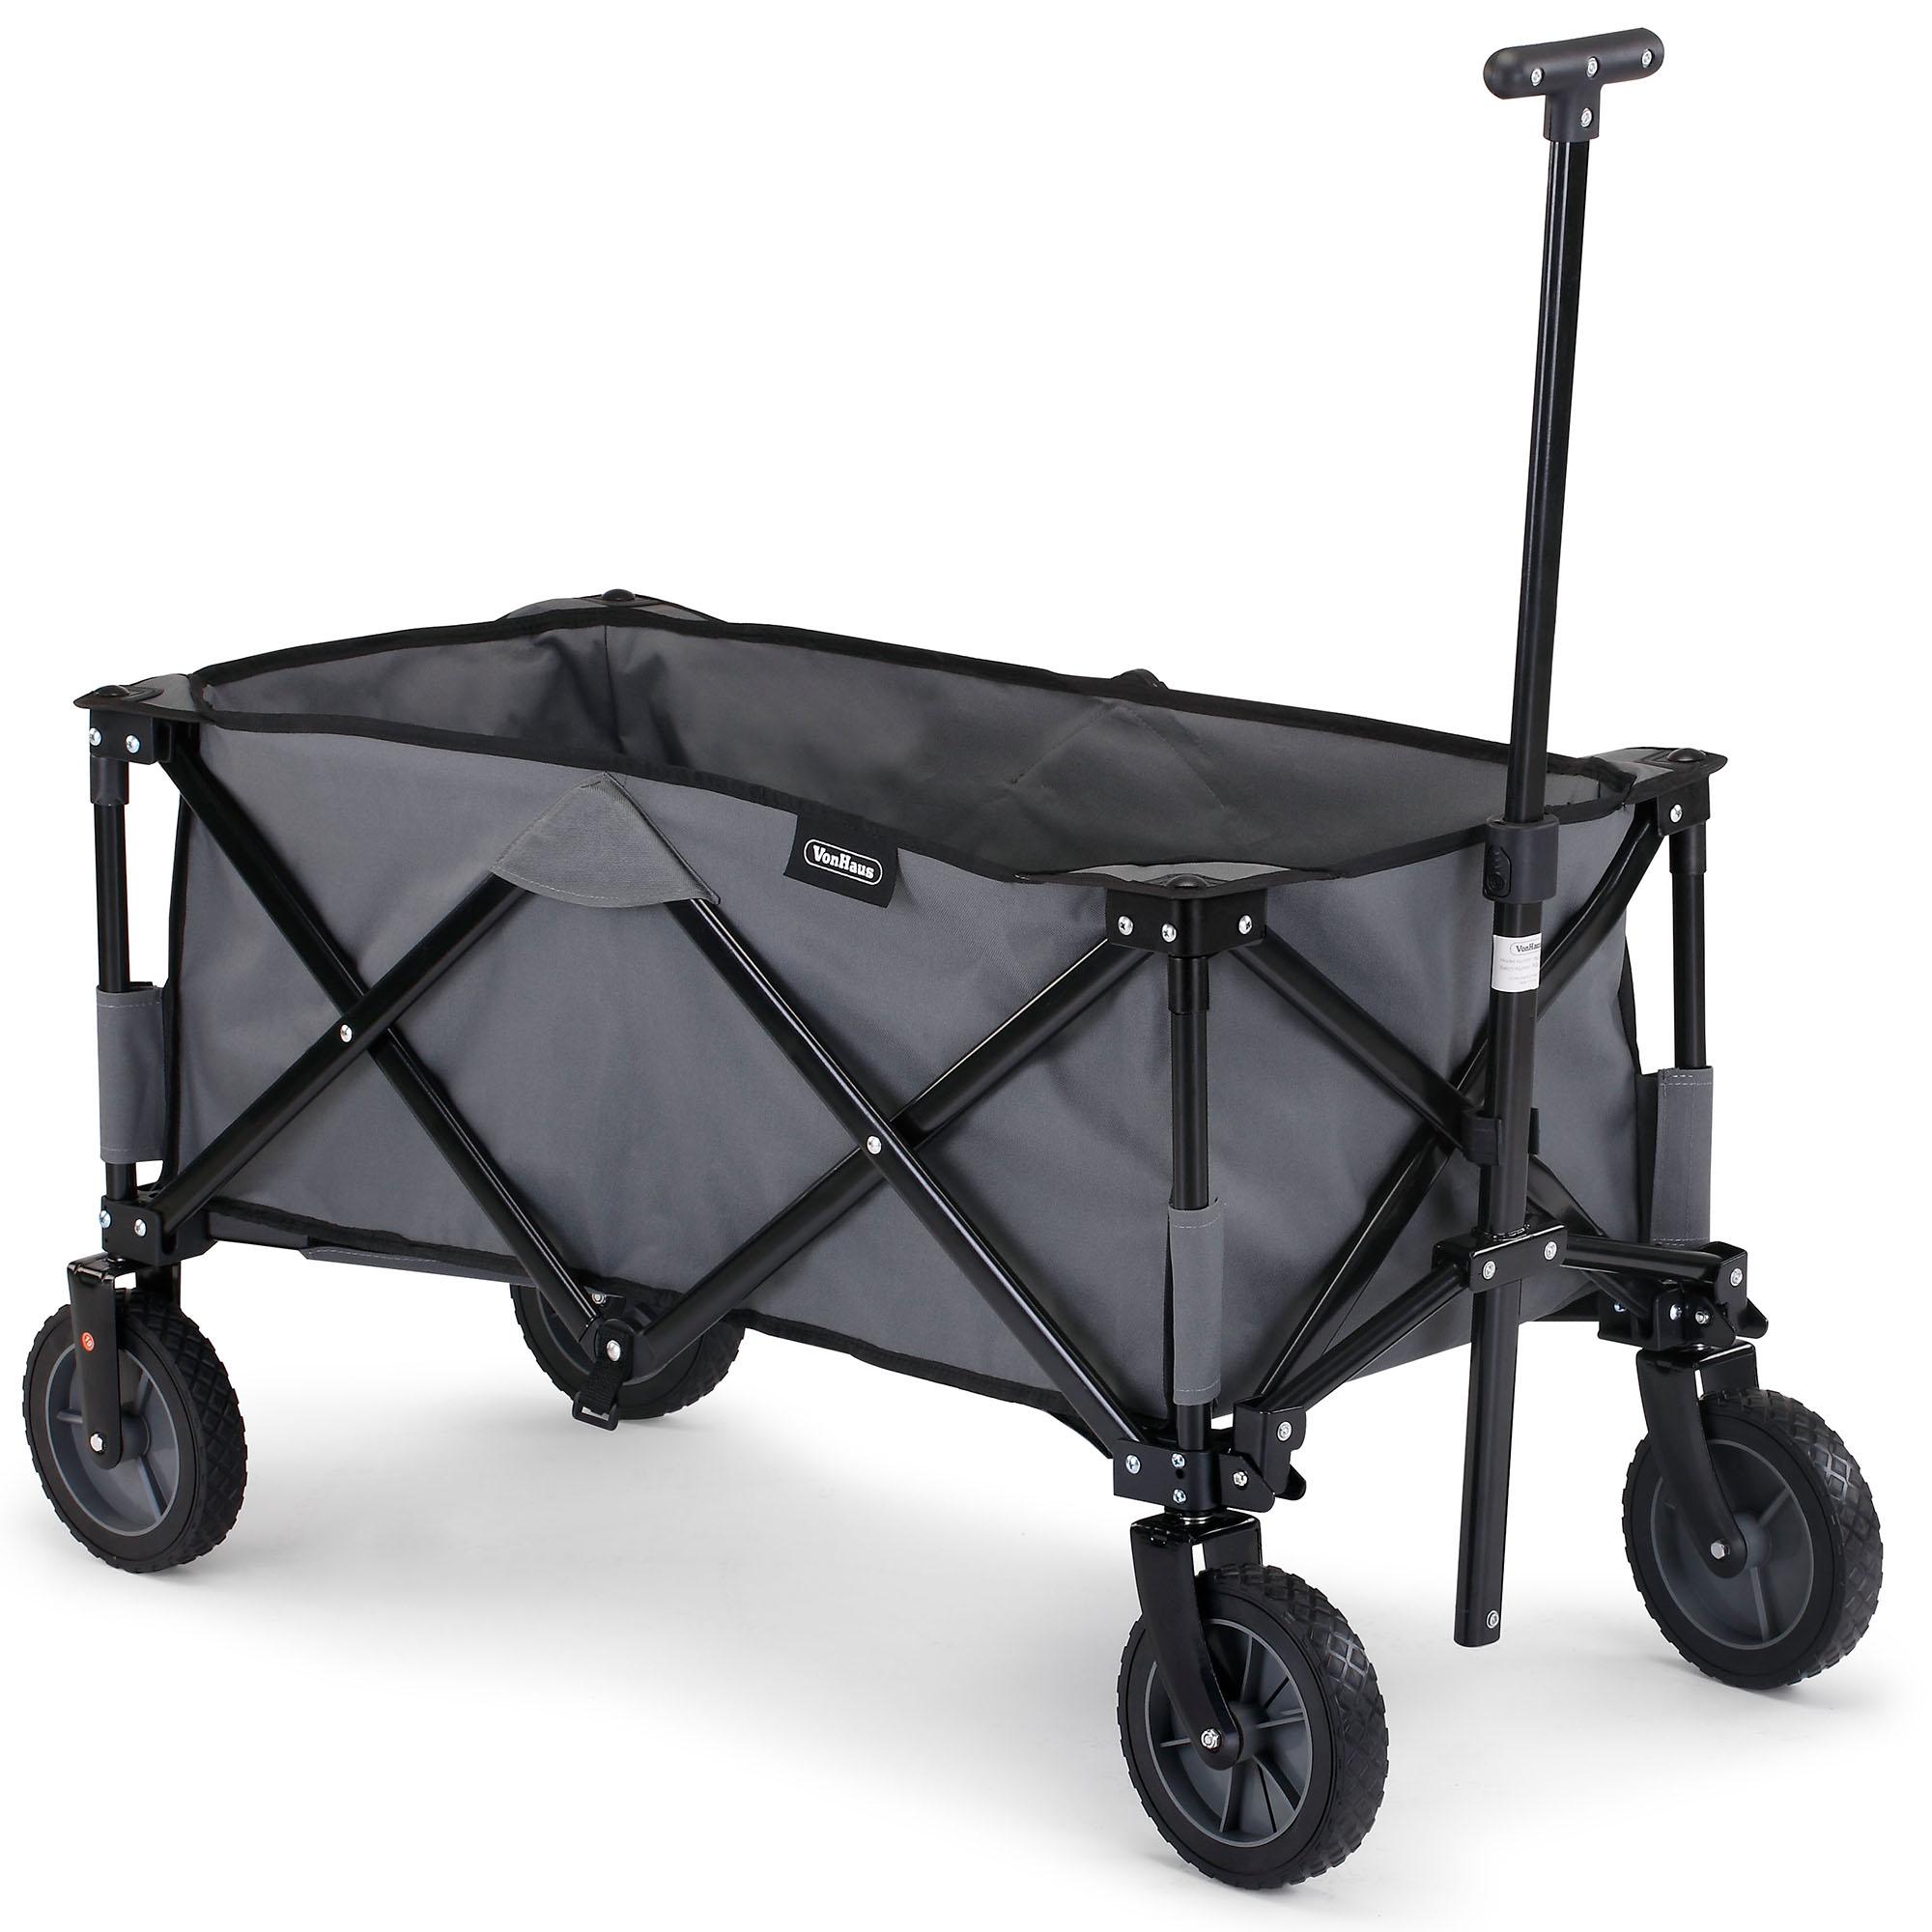 Sentinel Thumbnail 1. Sentinel VonHaus Folding Camping Cart U2013 Collapsible Garden  Wagon